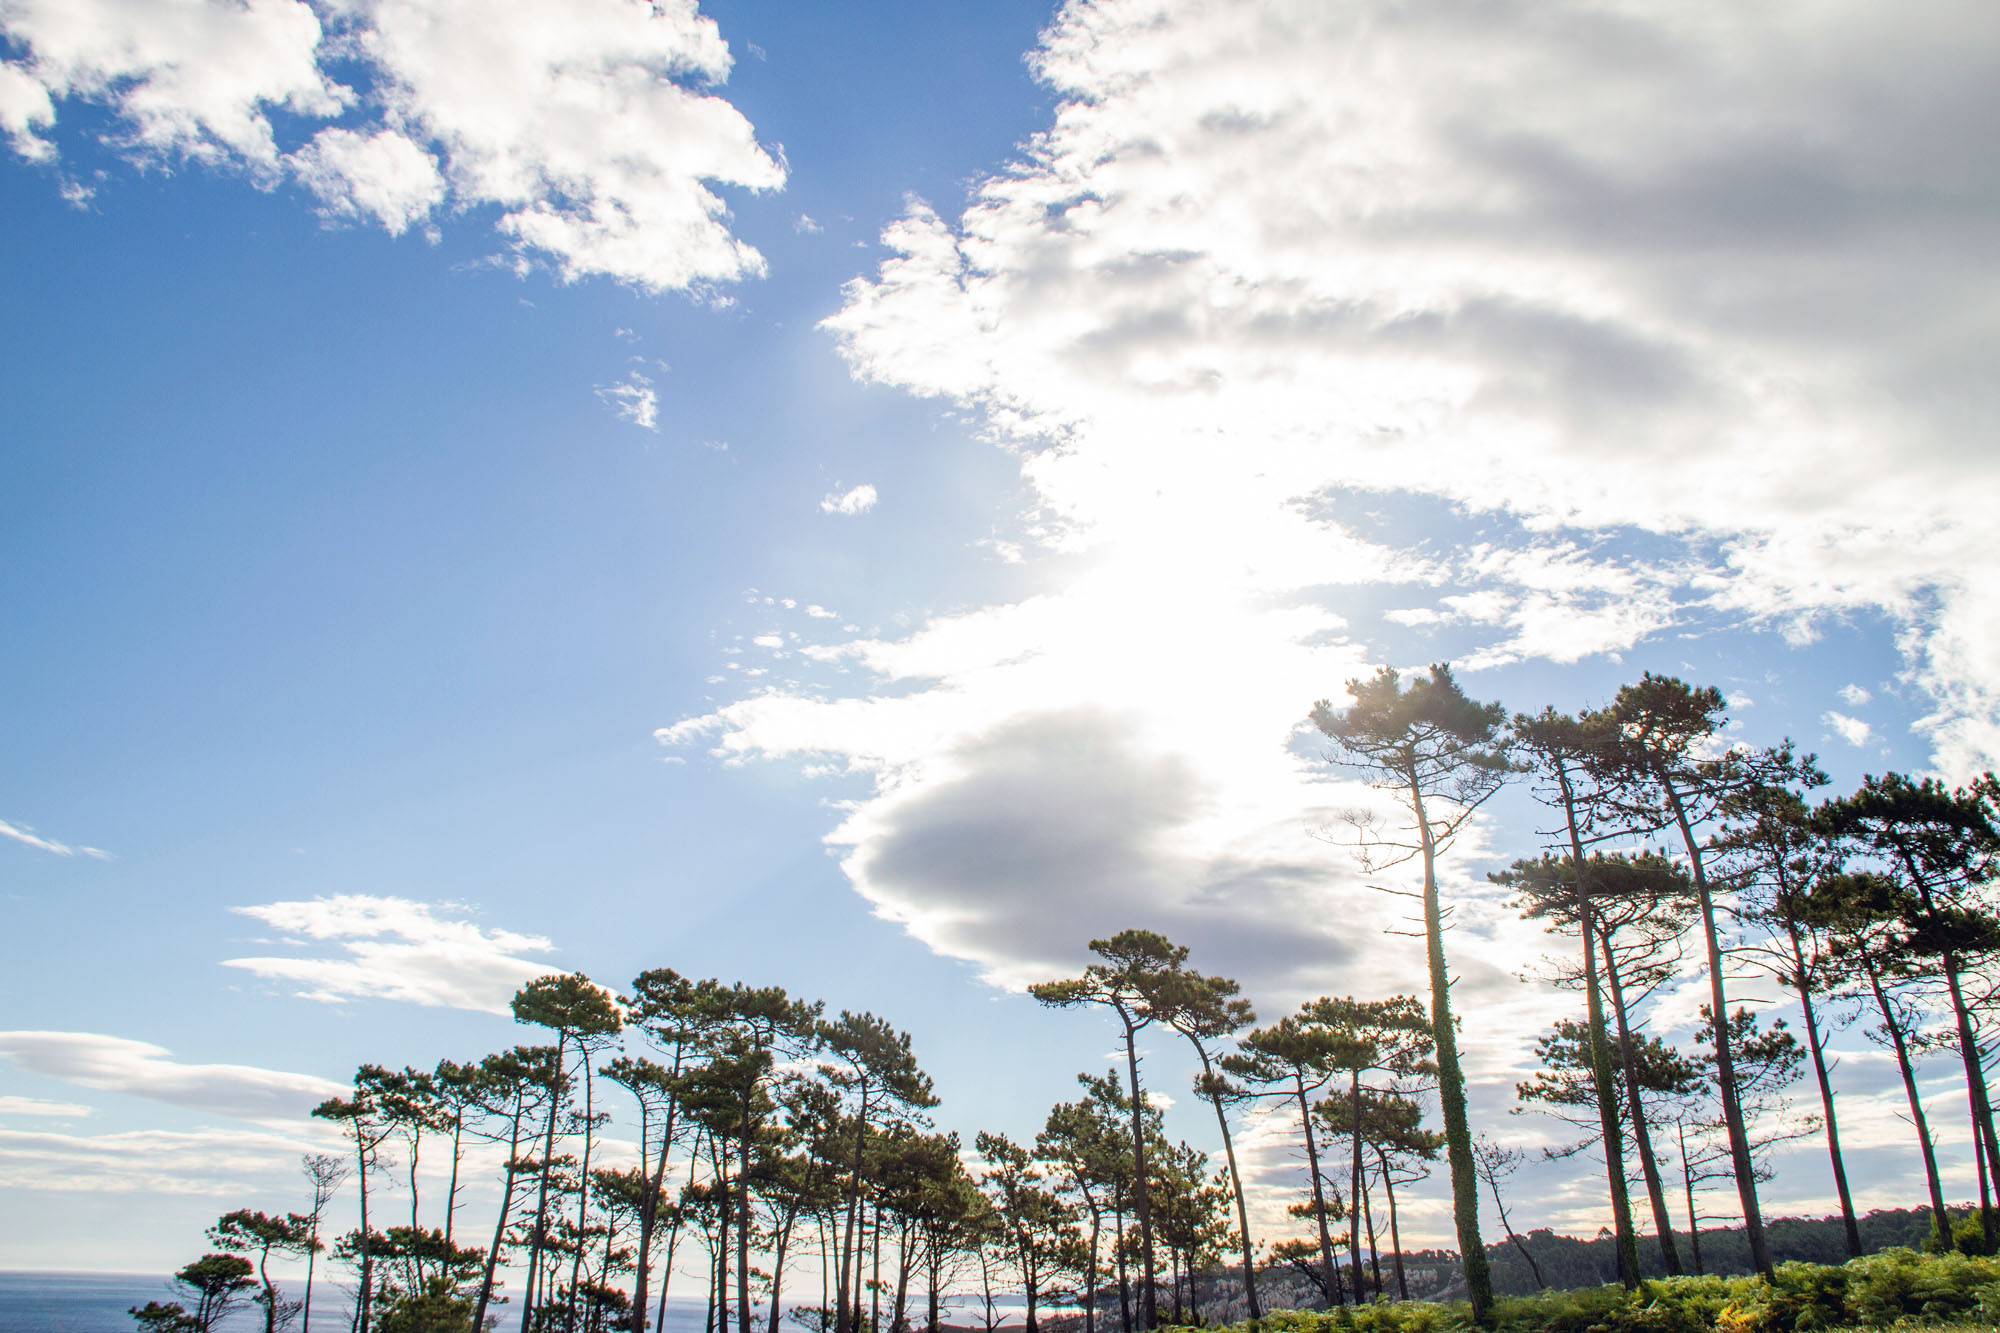 Trees Vega Asturias